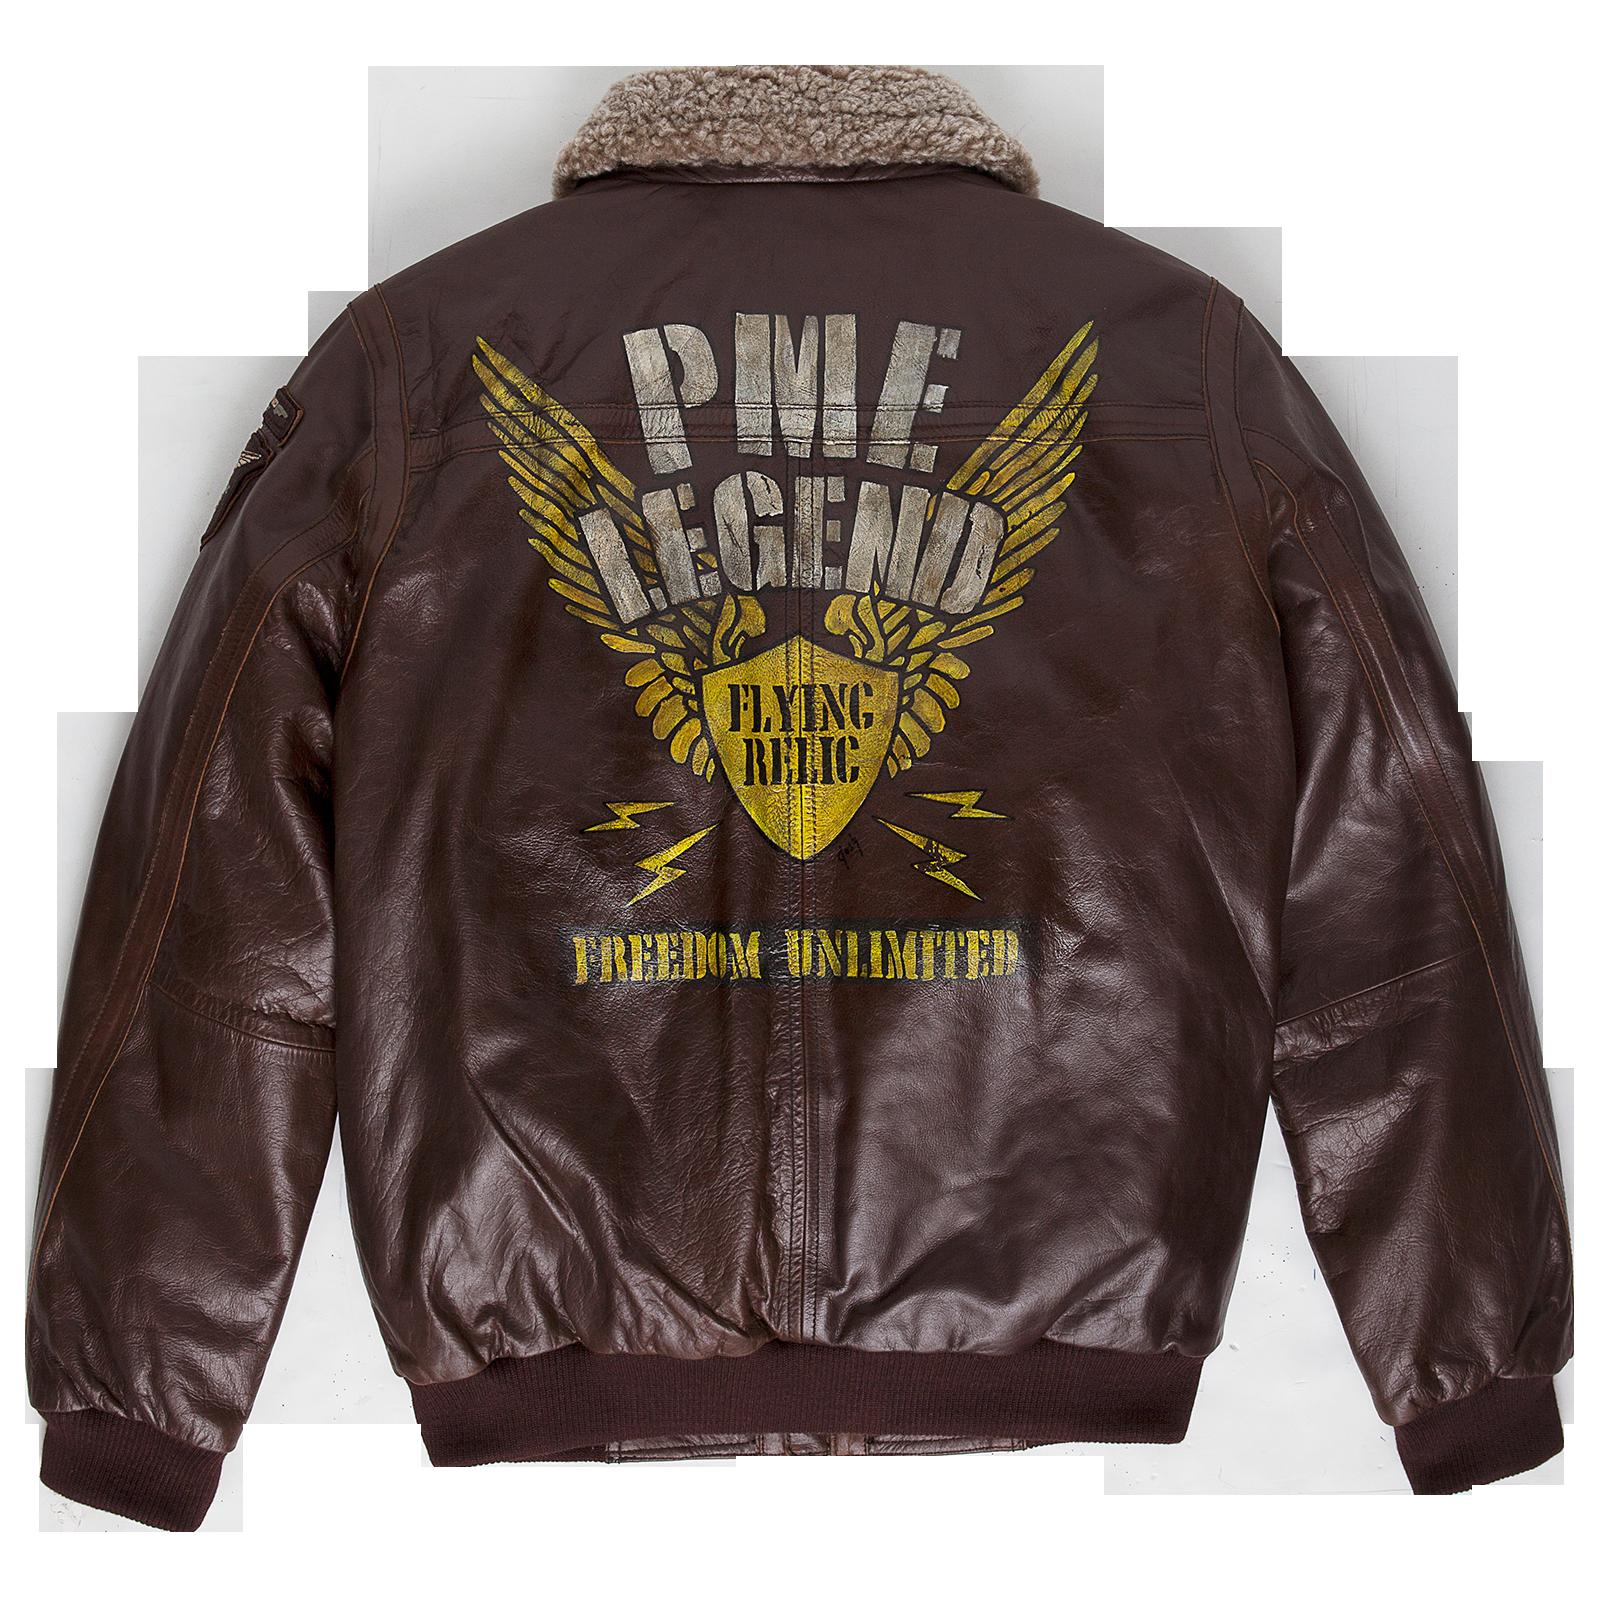 Type 4 Original Pme Legend Leather Hudson Bomber Jacket Flying Relic Hand Painted Nose Art Seri Leather Flight Jacket Flying Jacket Leather Bomber Jacket [ 1600 x 1600 Pixel ]